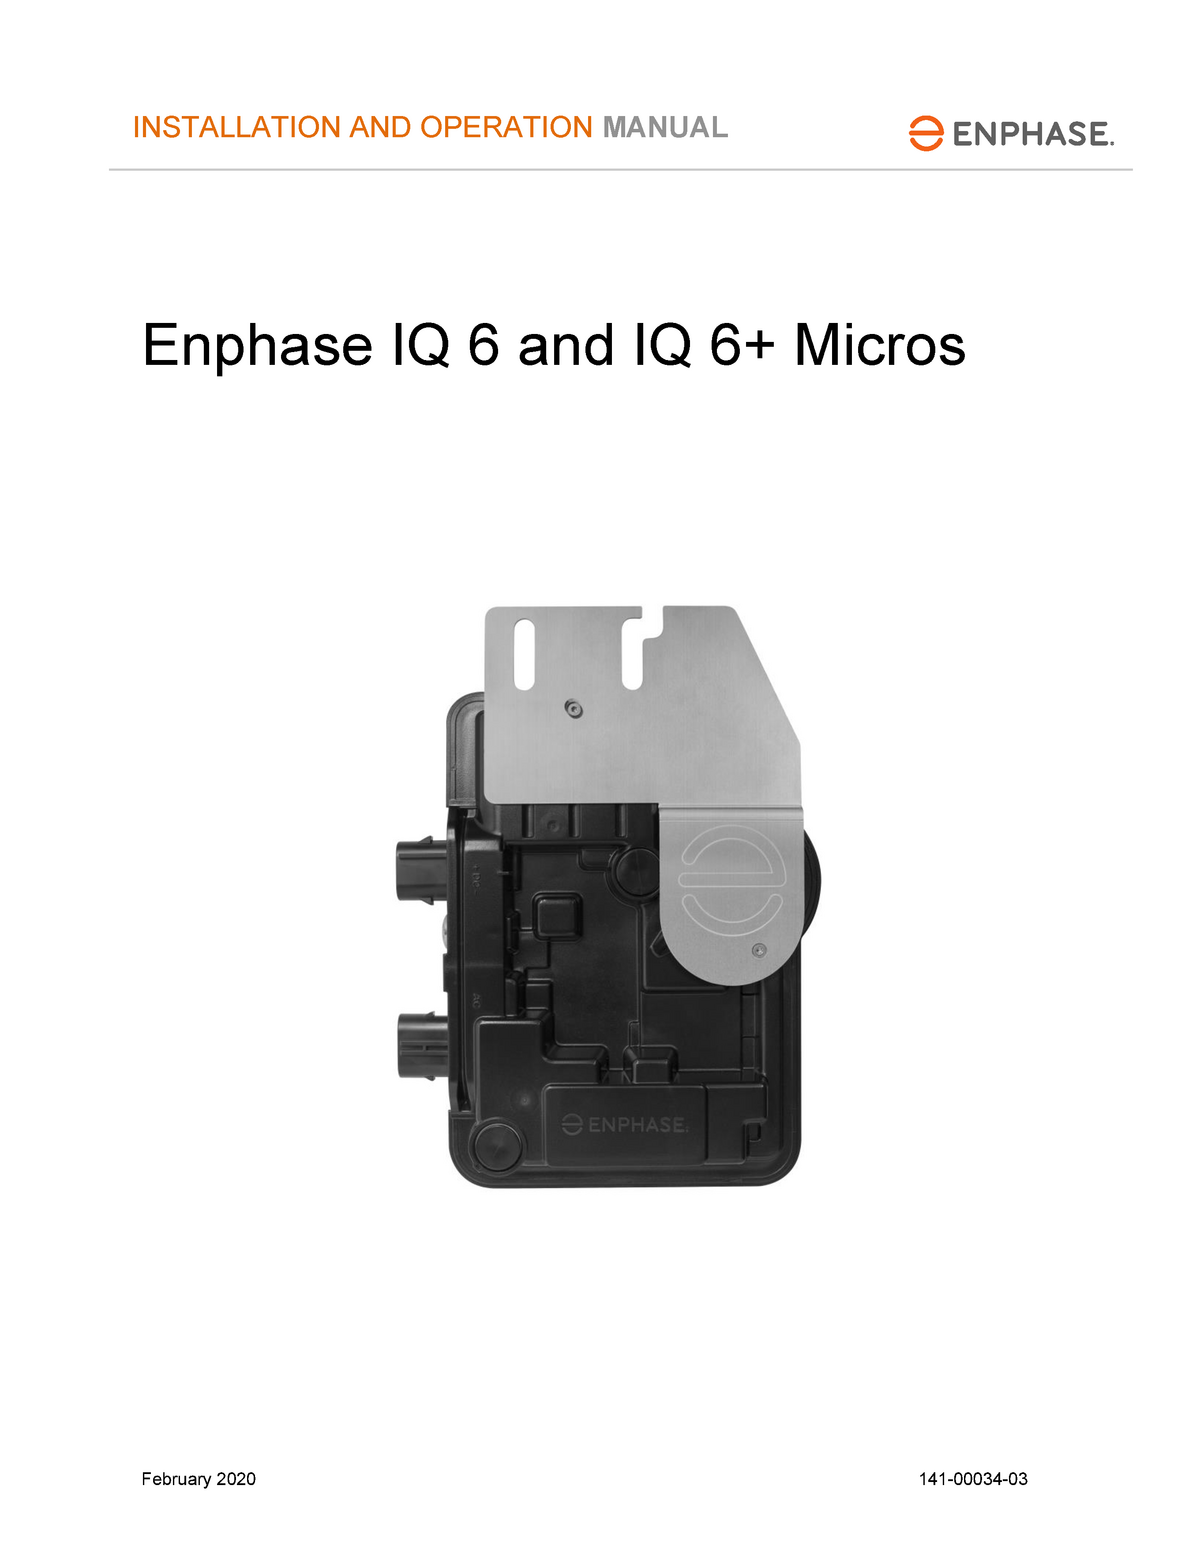 IQ40 IQ40Plus Micro Manual EN US   StuDocu